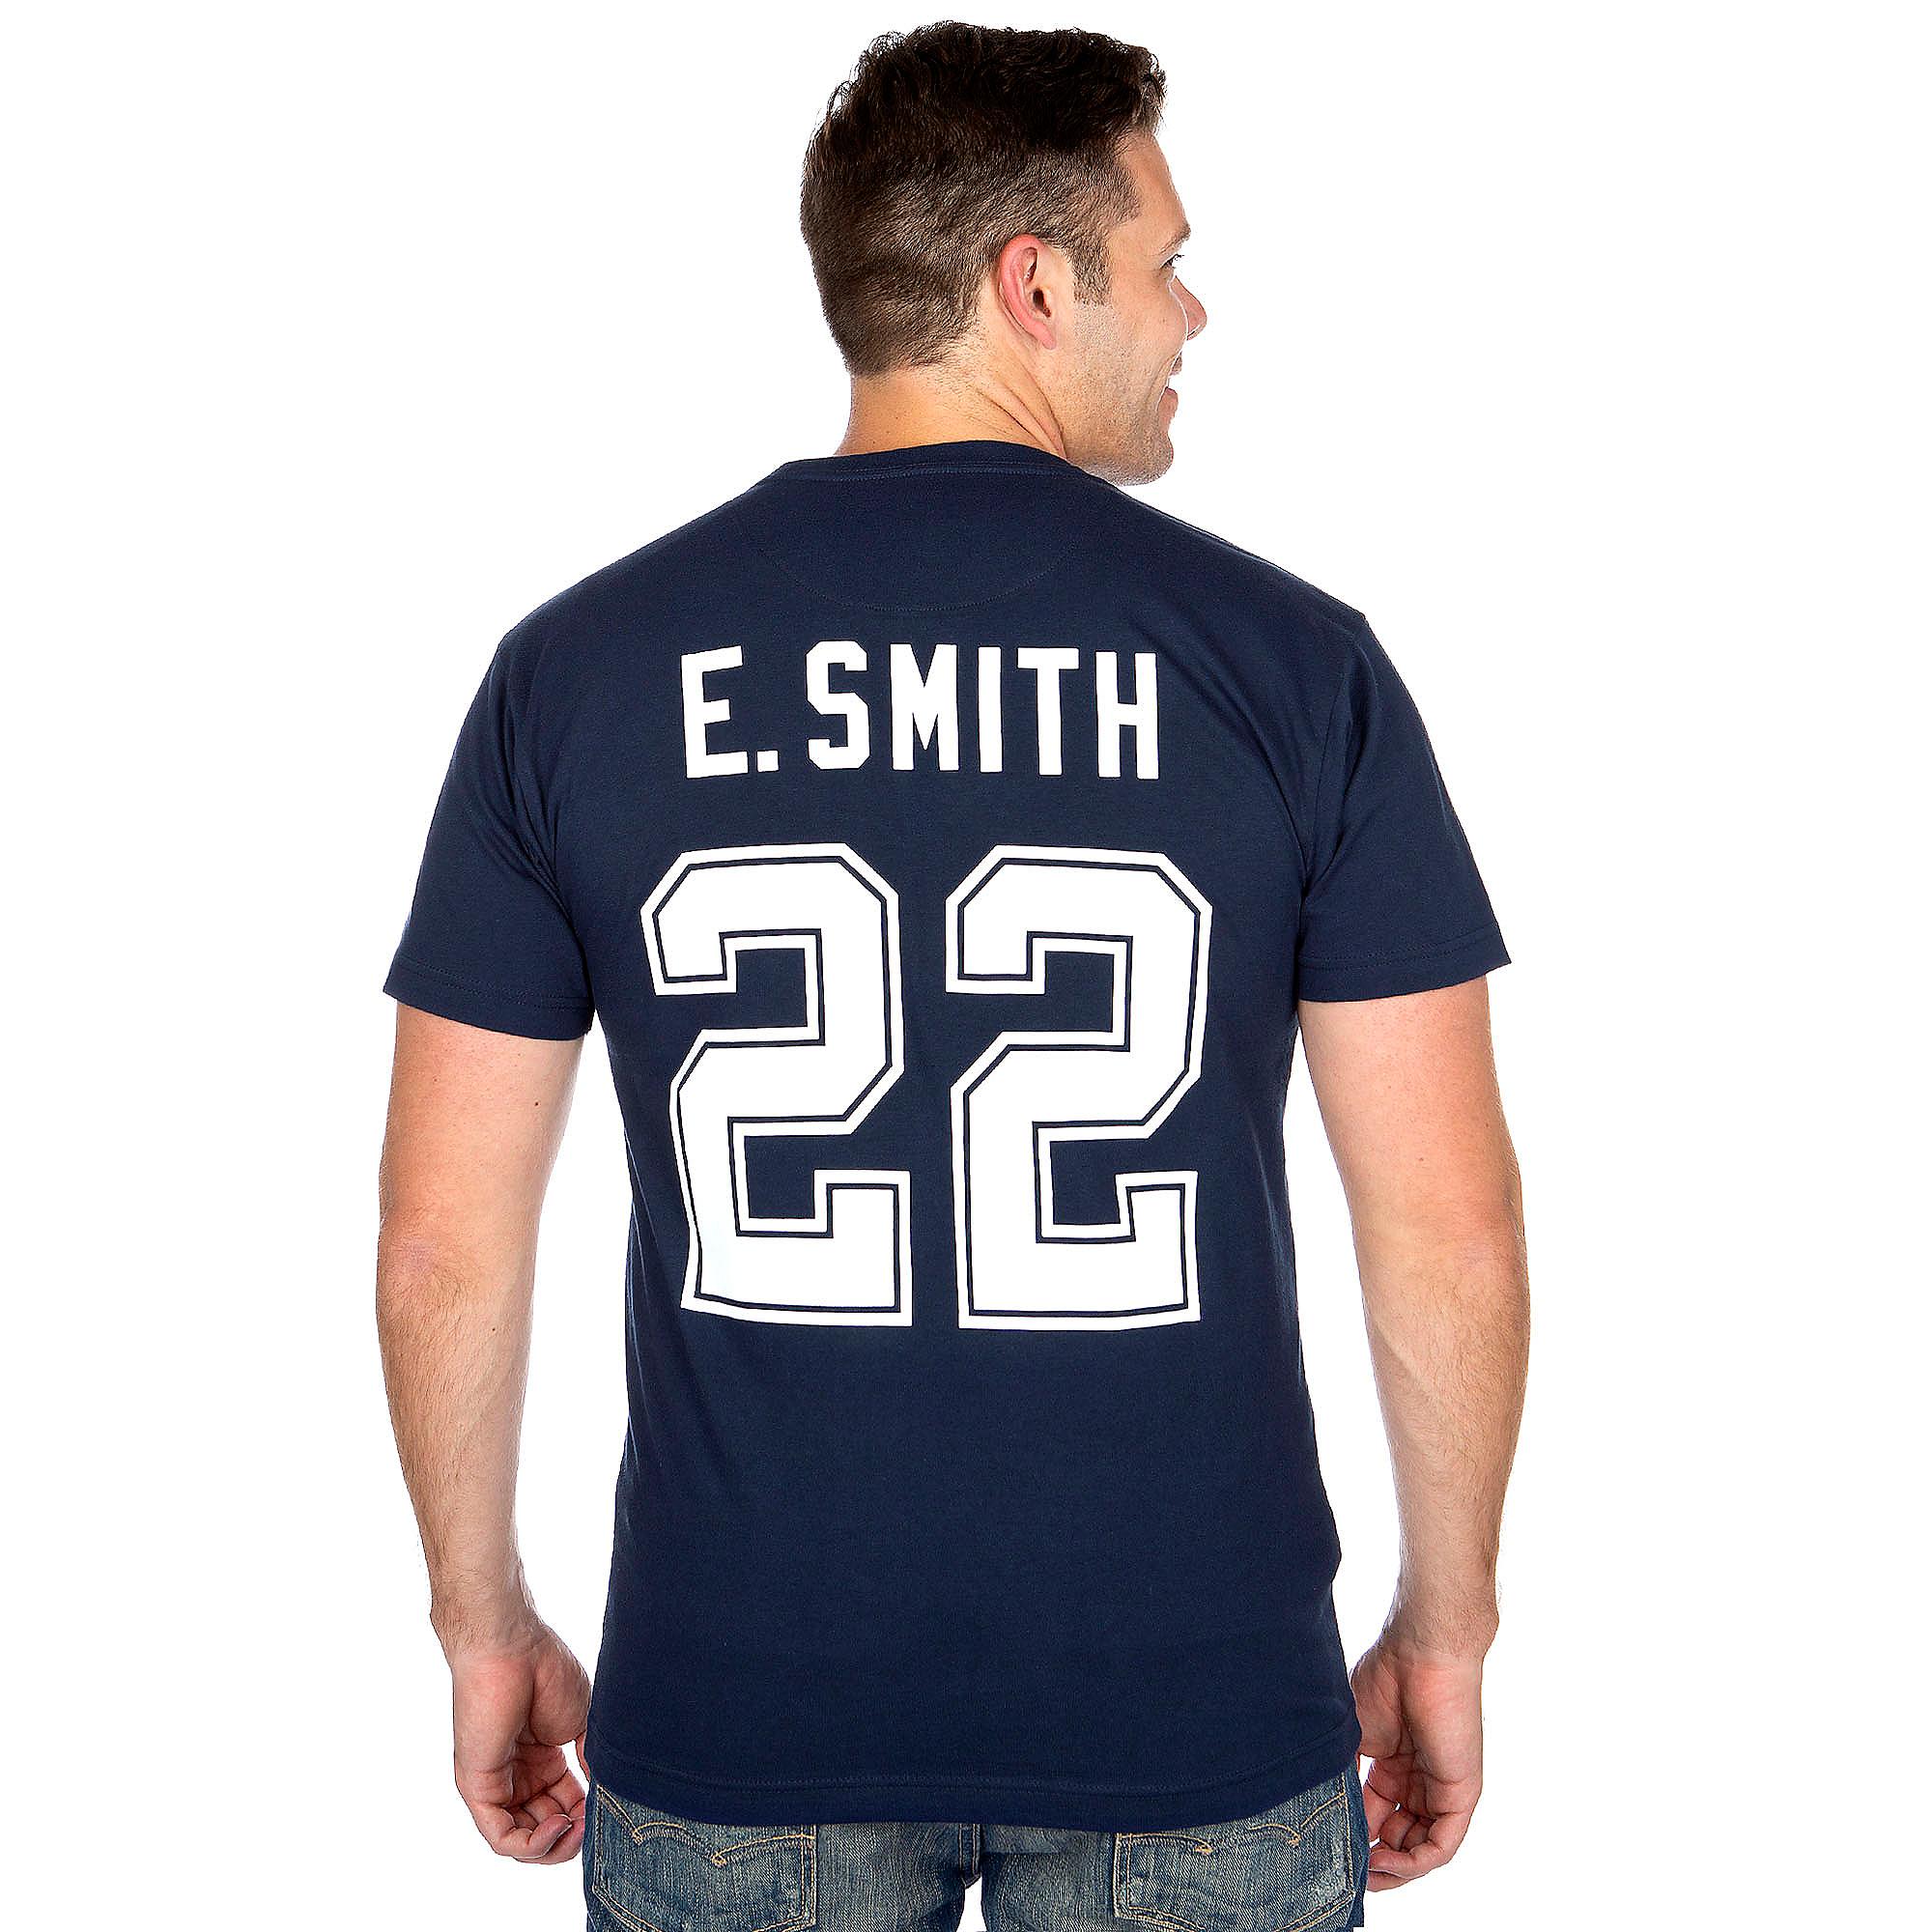 premium selection 9ca3f 33a7e Dallas Cowboys Mitchell & Ness Emmitt Smith #22 Name & Number Tee | Dallas  Cowboys Pro Shop